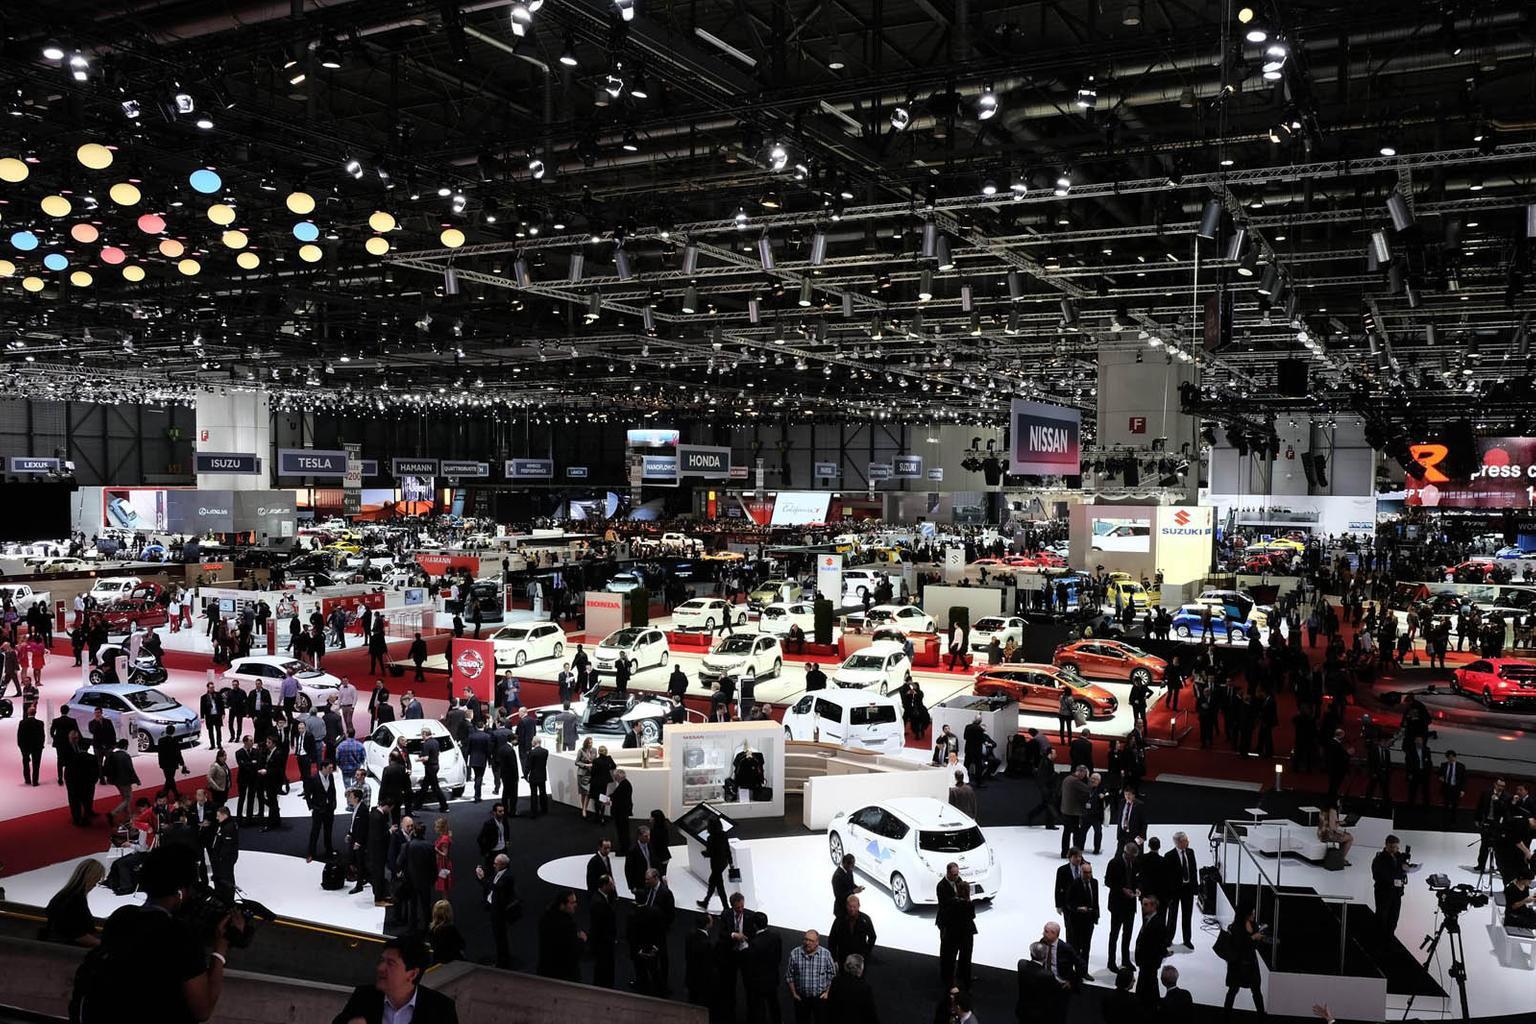 Geneva motor show 2014 news round-up